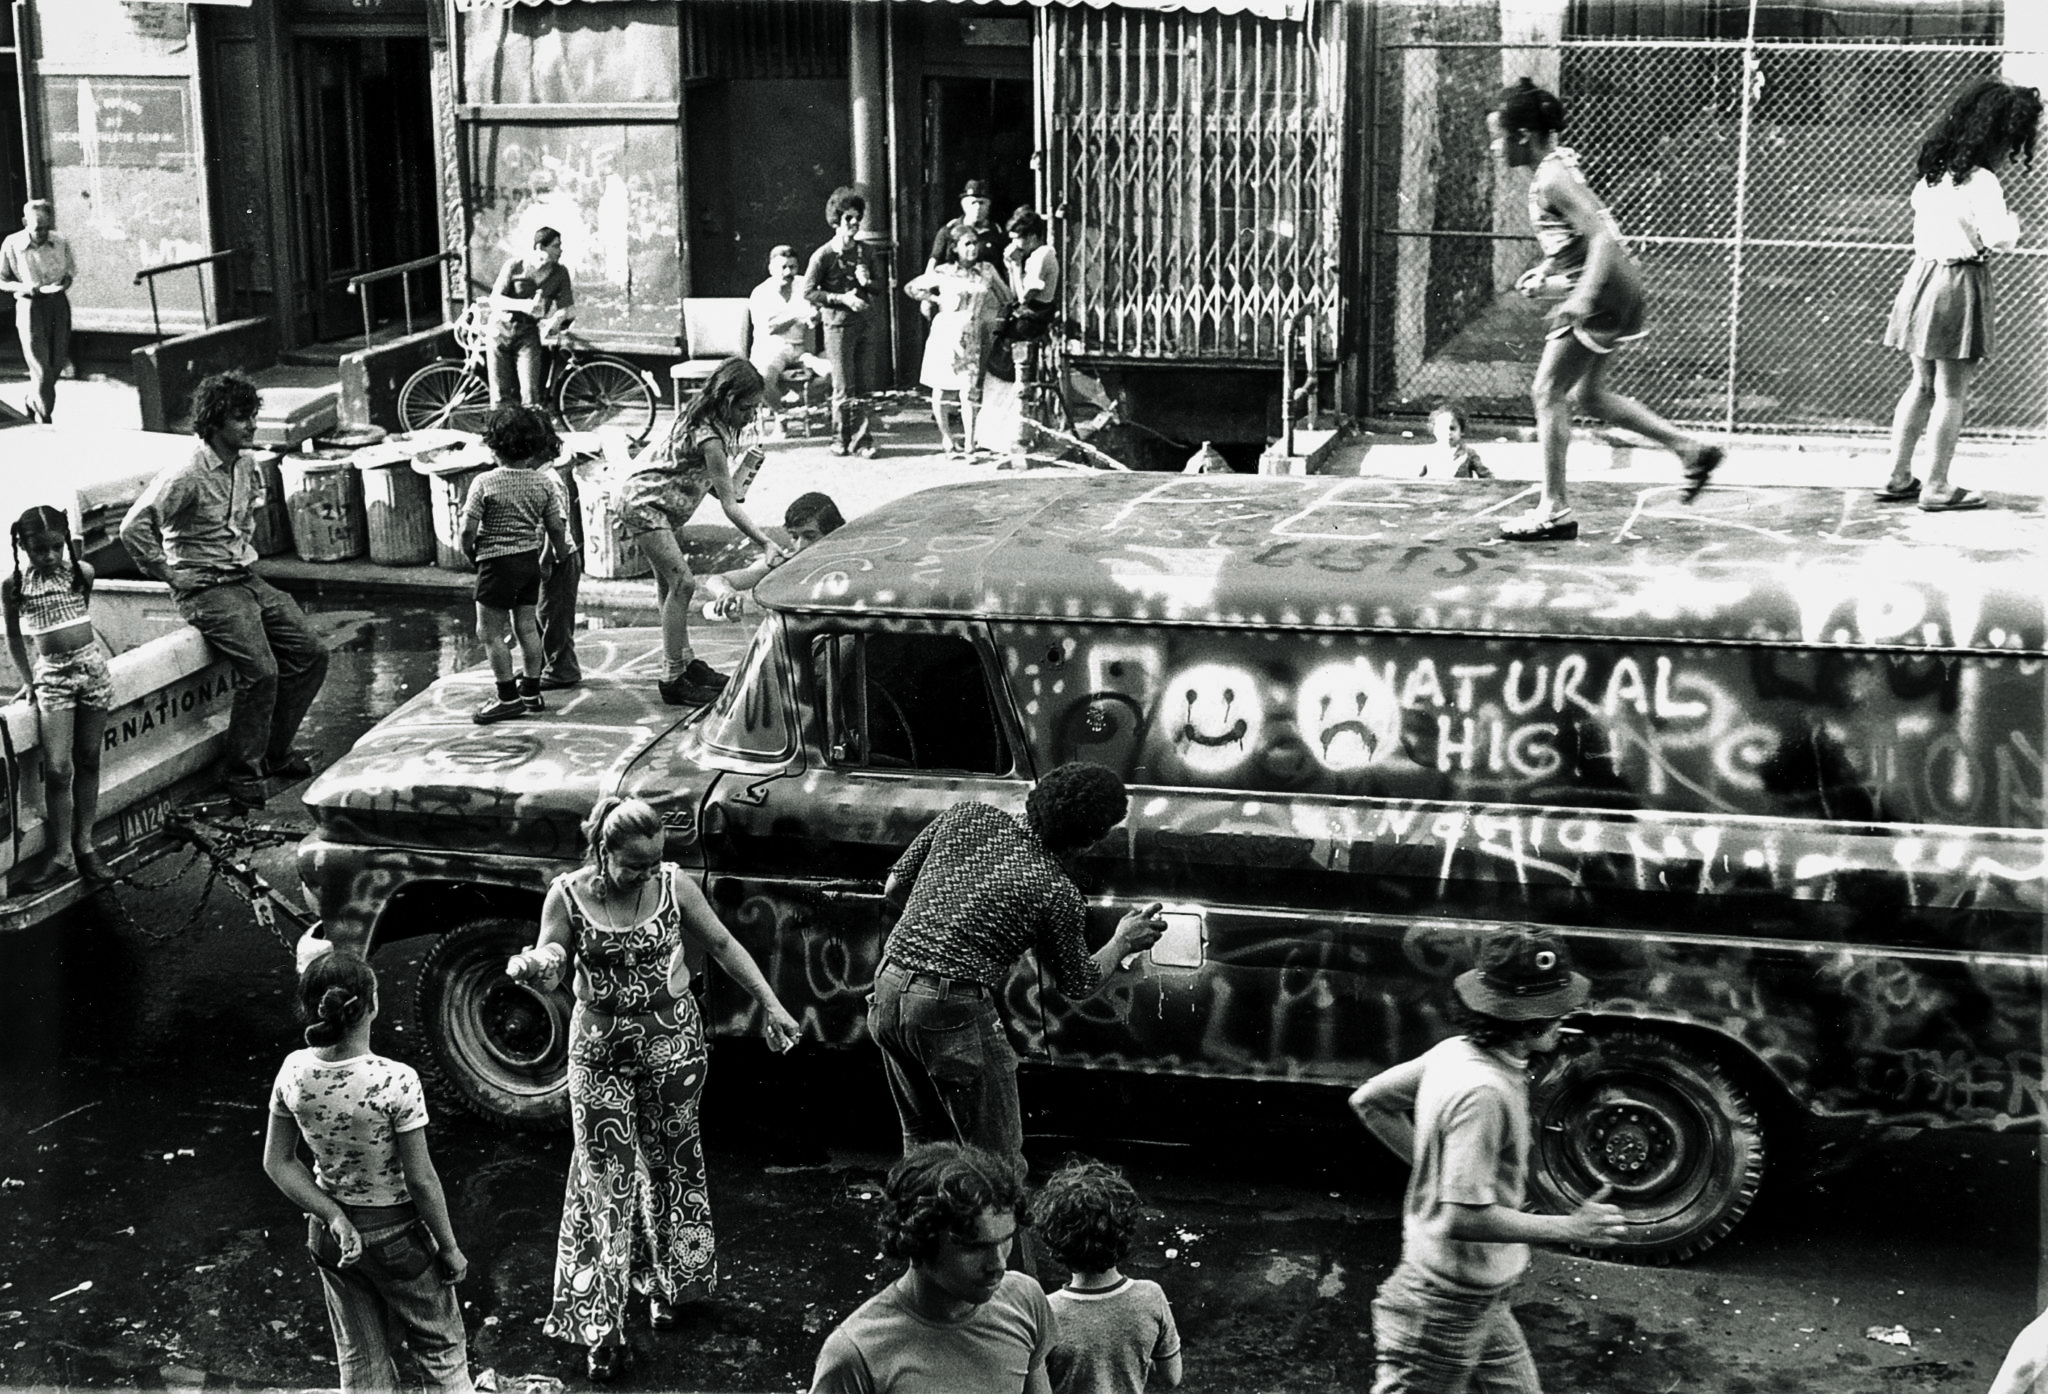 Habitants du Bronx peignant le Graffiti Truck de Gordon Matta-Clark, juin 1973 Photo d'archive Courtesy The Estate of Gordon Matta-Clark et David Zwirner, New York / Londres / Hong Kong. © 2018 The Estate of Gordon Matta-Clark / ADAGP, Paris